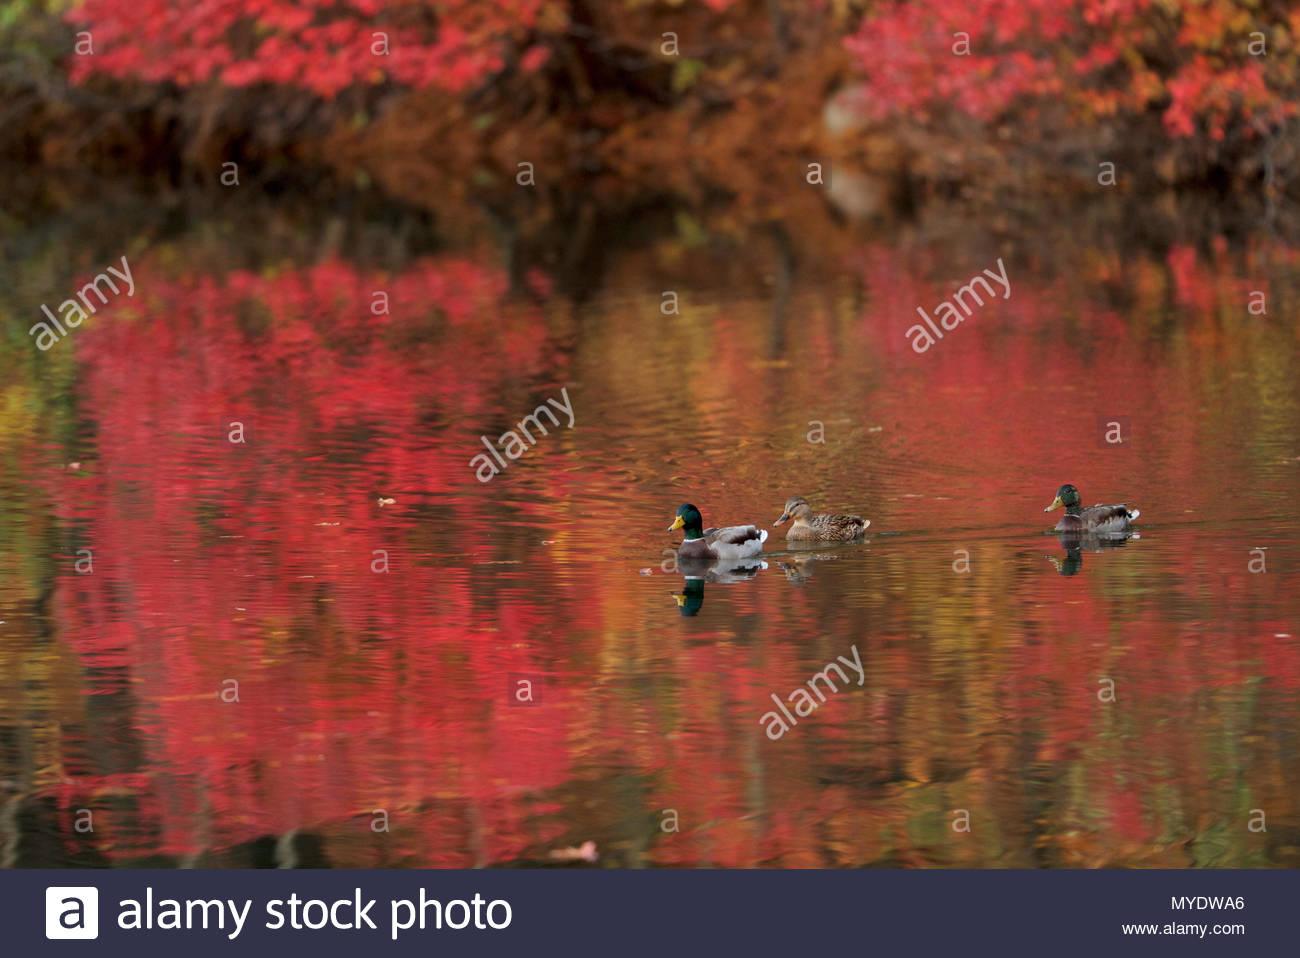 Mallards, Anas platyrhynchos, swim on Walden Pond. Stock Photo